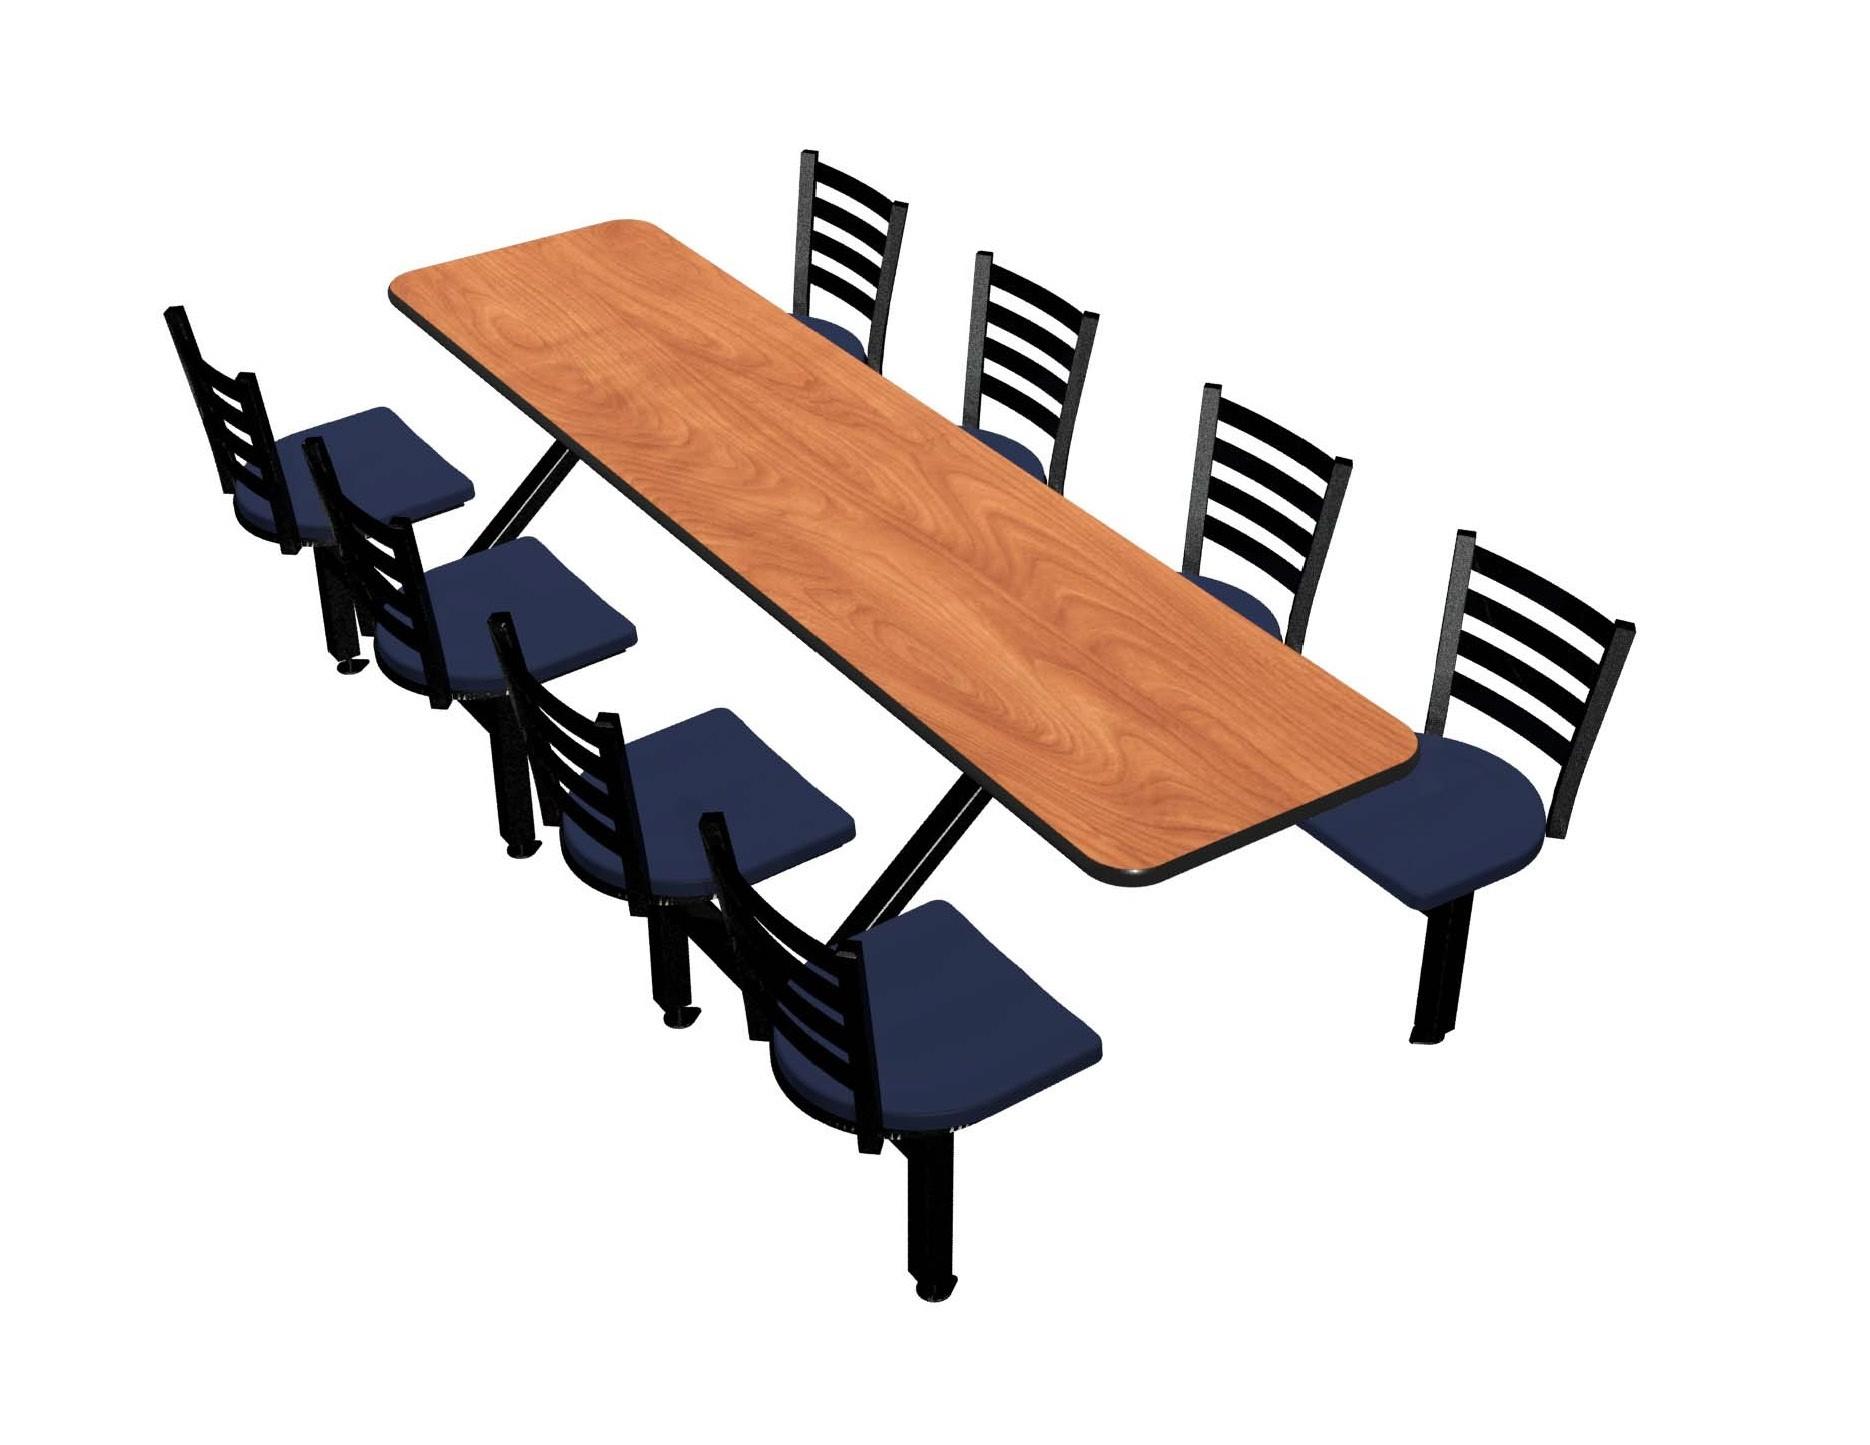 Wild Cherry laminate table, Black vinyl edge, Encore chairhead with Atlantis seat